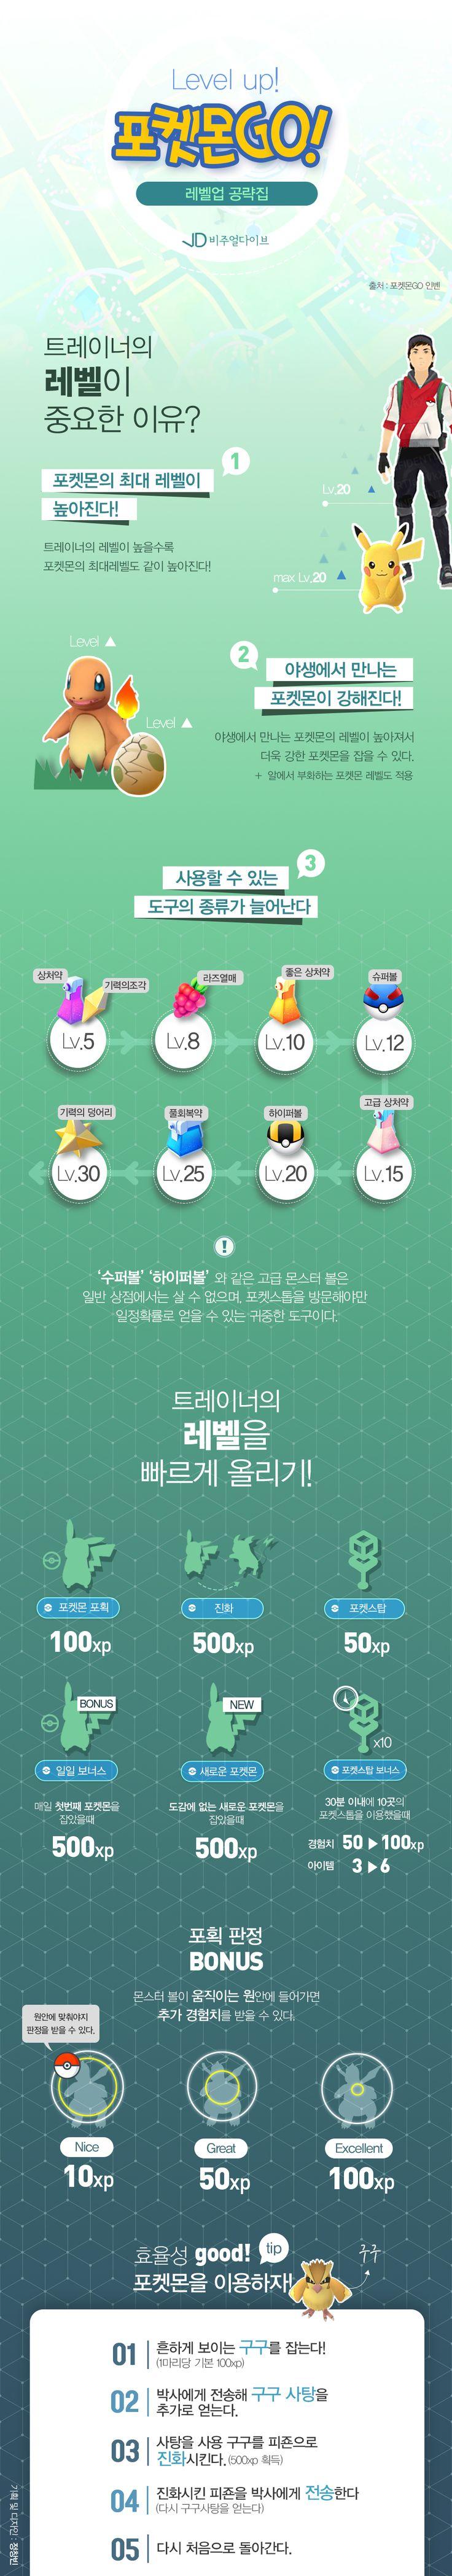 'LEVEL UP' 포켓몬GO 레벨업 공략집 [인포그래픽] #poketmongo / #Infographic ⓒ 비주얼다이브 무단 복사·전재·재배포 금지